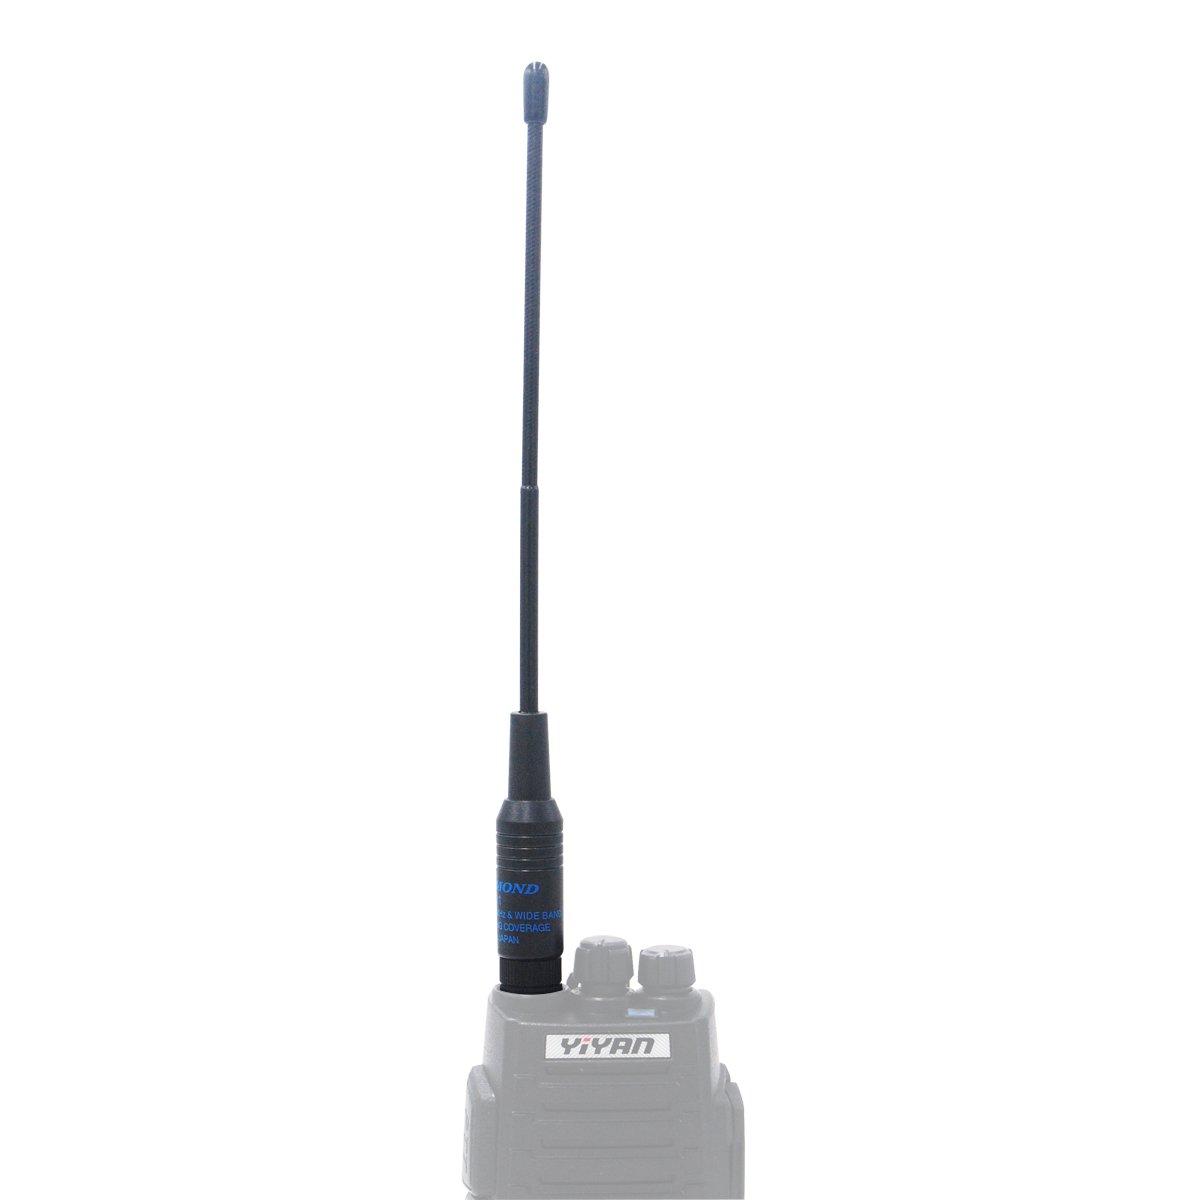 Walkie Talkie Antenna SMA-M//SMA-F//BNC Dual Band VHF UHF High Gain Antennas for Two Way Radio SHR805S, SMA-M